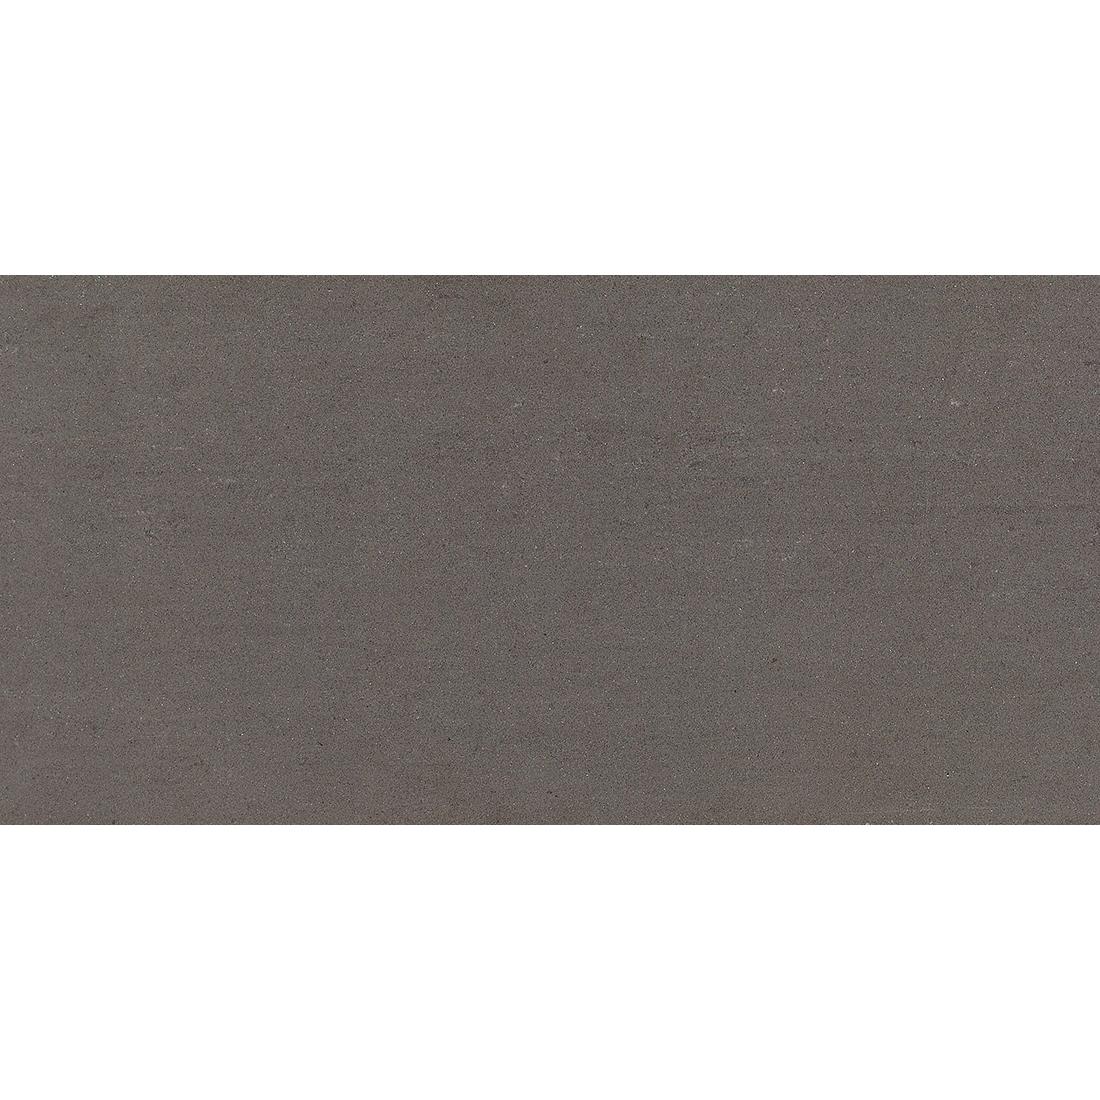 Crystal 30x60 Dark Grey Matt 1